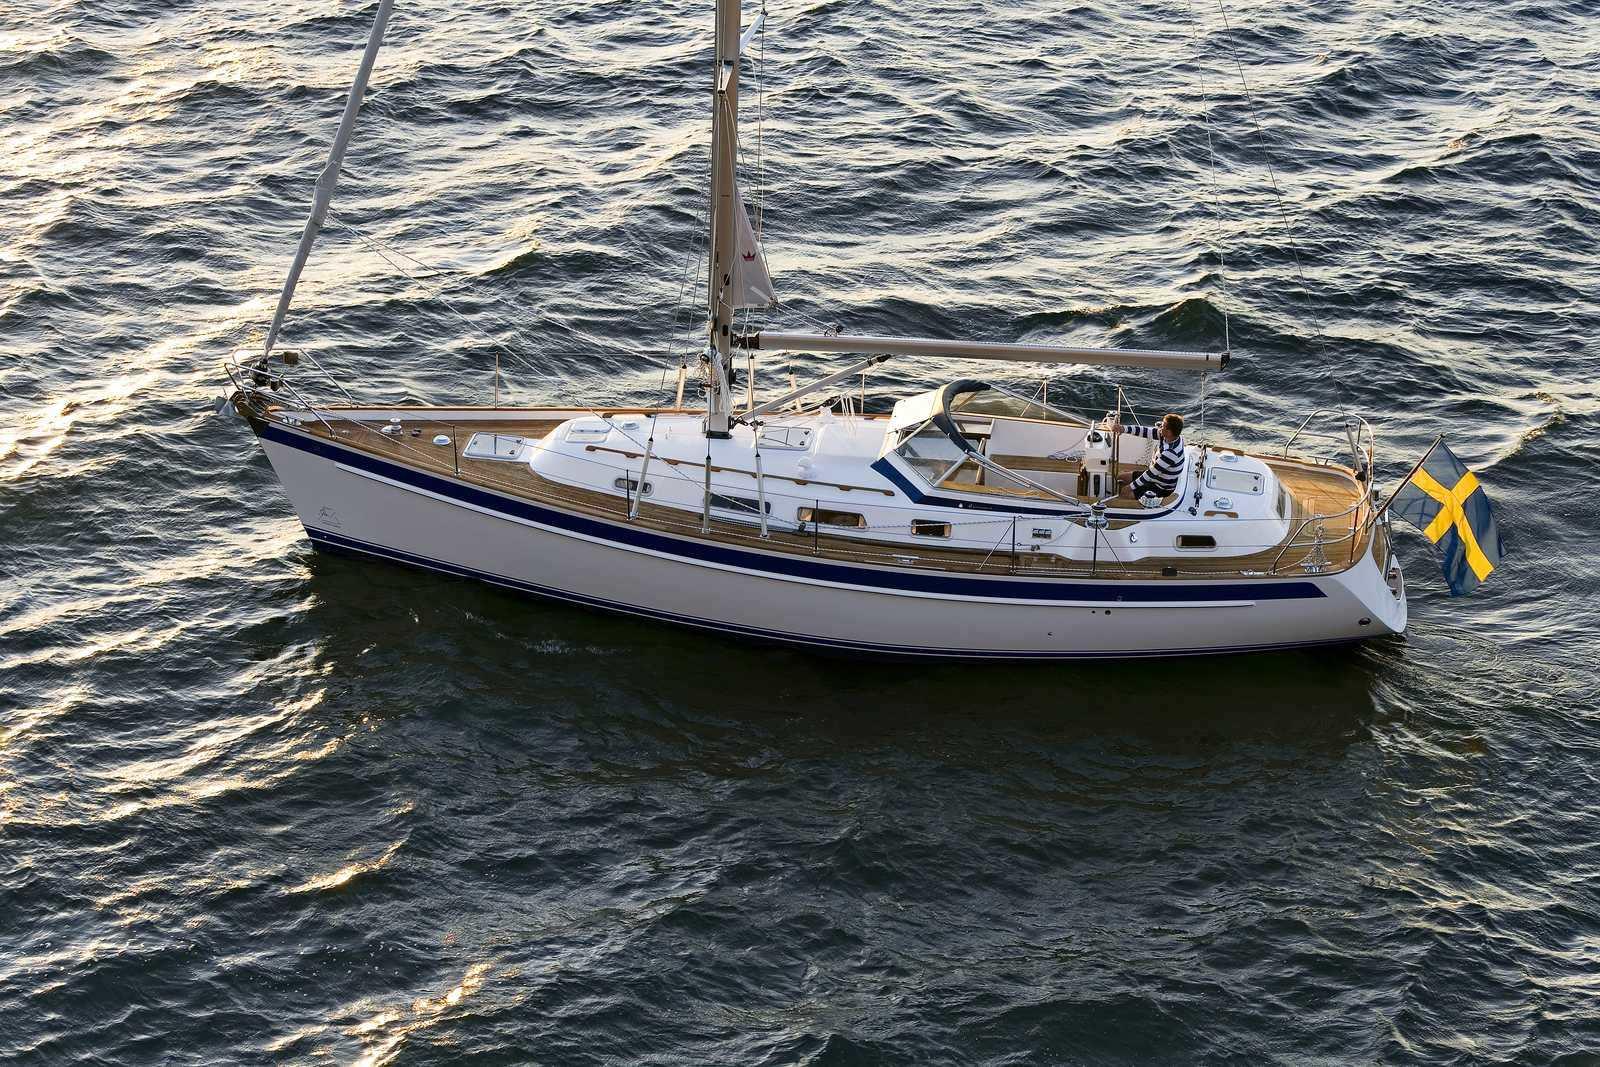 cruising-sailboat-center-cockpit-teak-deck-20176-7124855